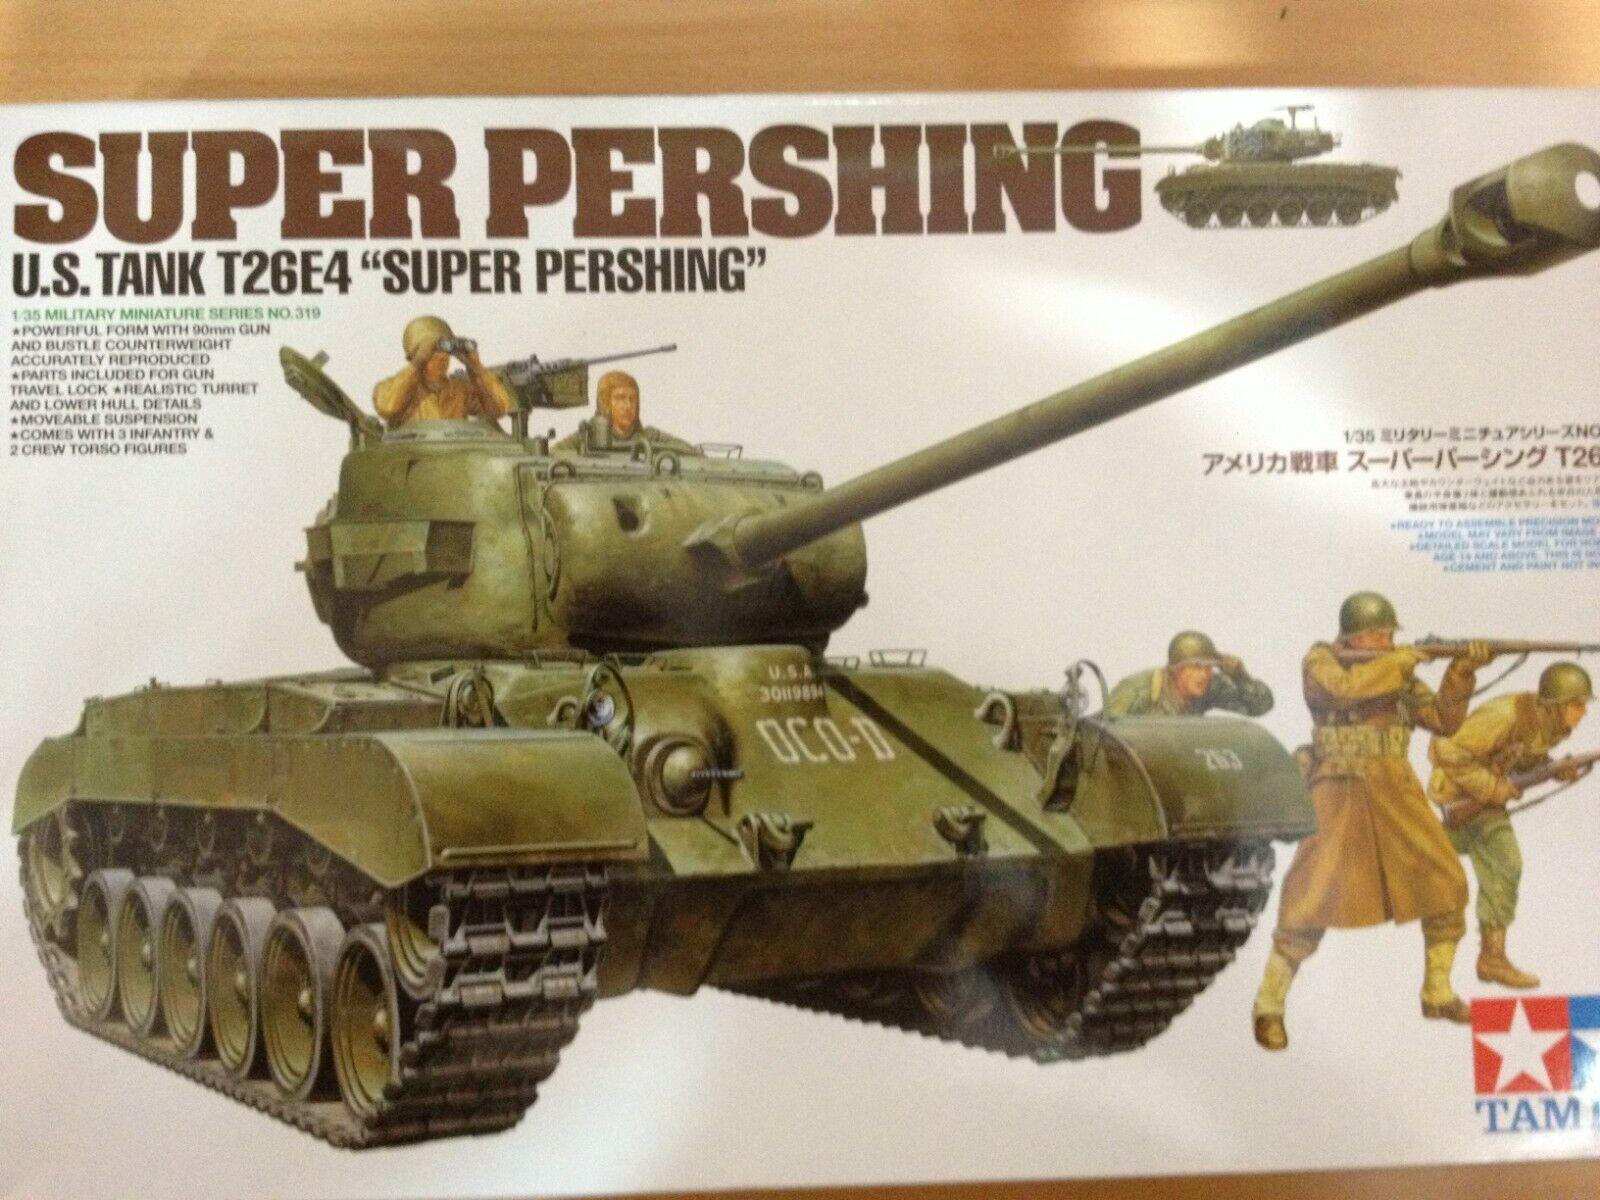 Tamiya Maqueta,escala 1 35,SUPER PERSHING,U.S TANK T26E4,ref.35319